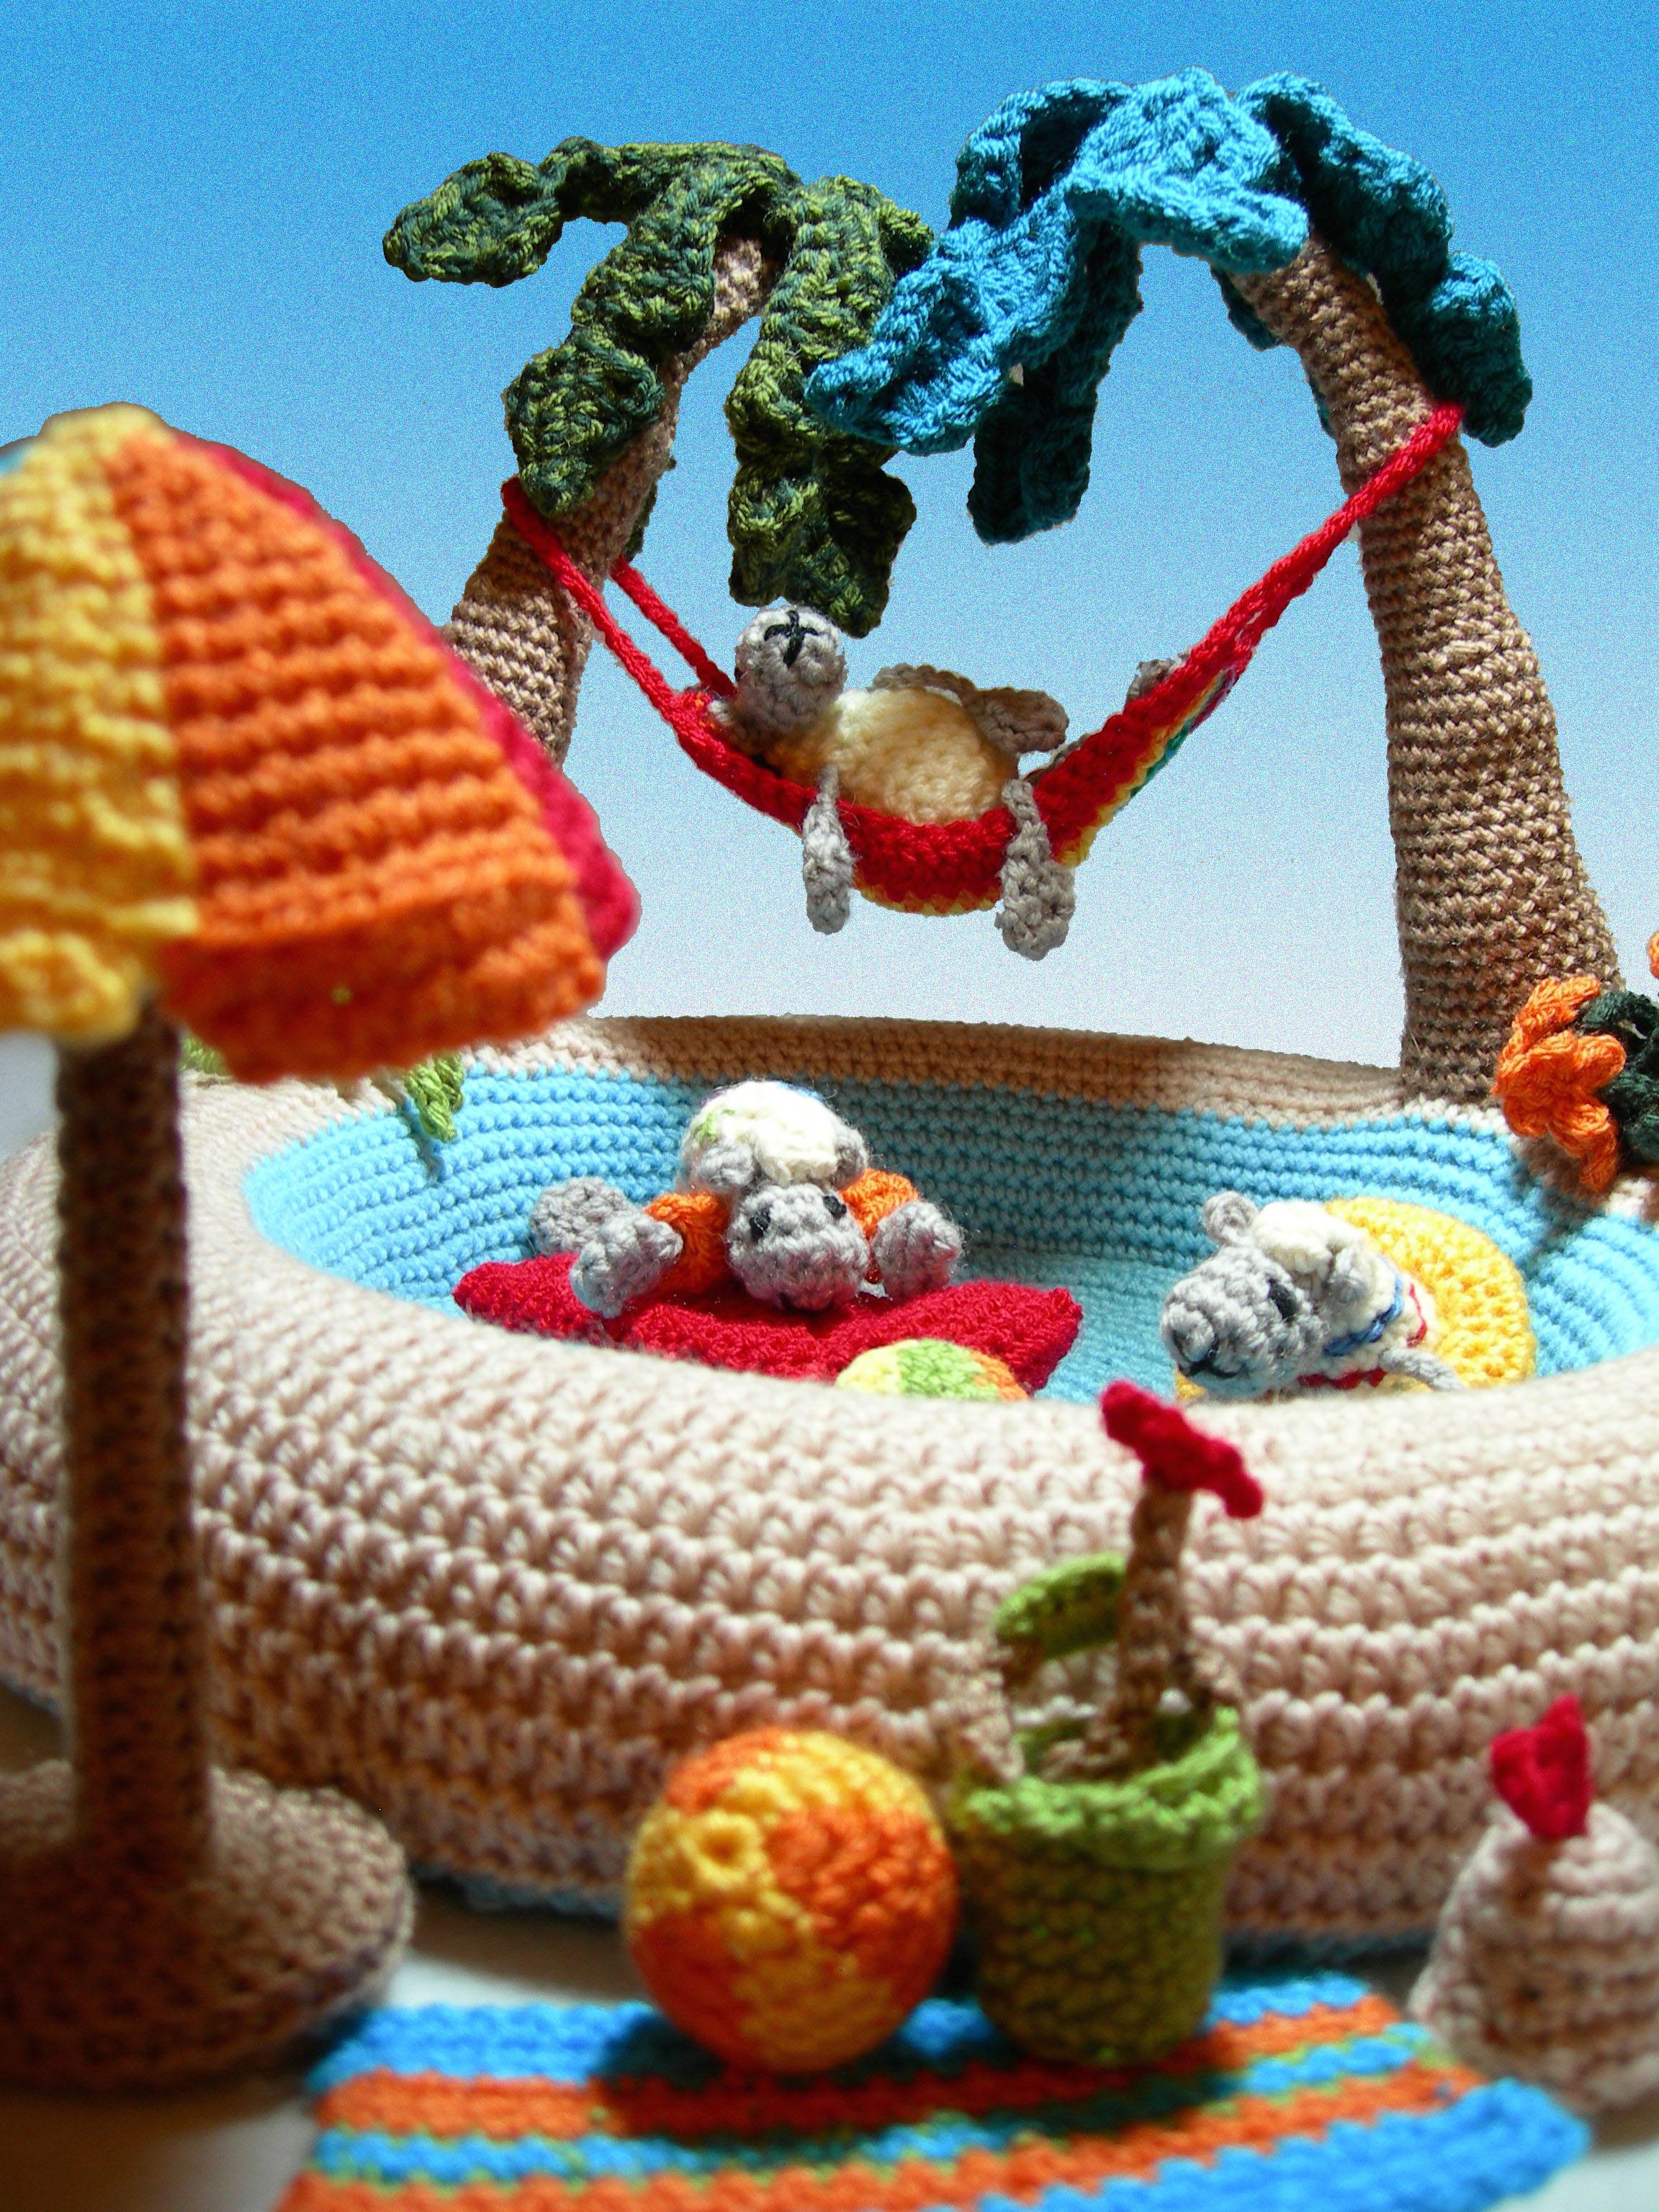 Sheep dip island pdf downloadable crochet pattern slightly sheepish sheep dip island pdf downloadable crochet pattern bankloansurffo Gallery